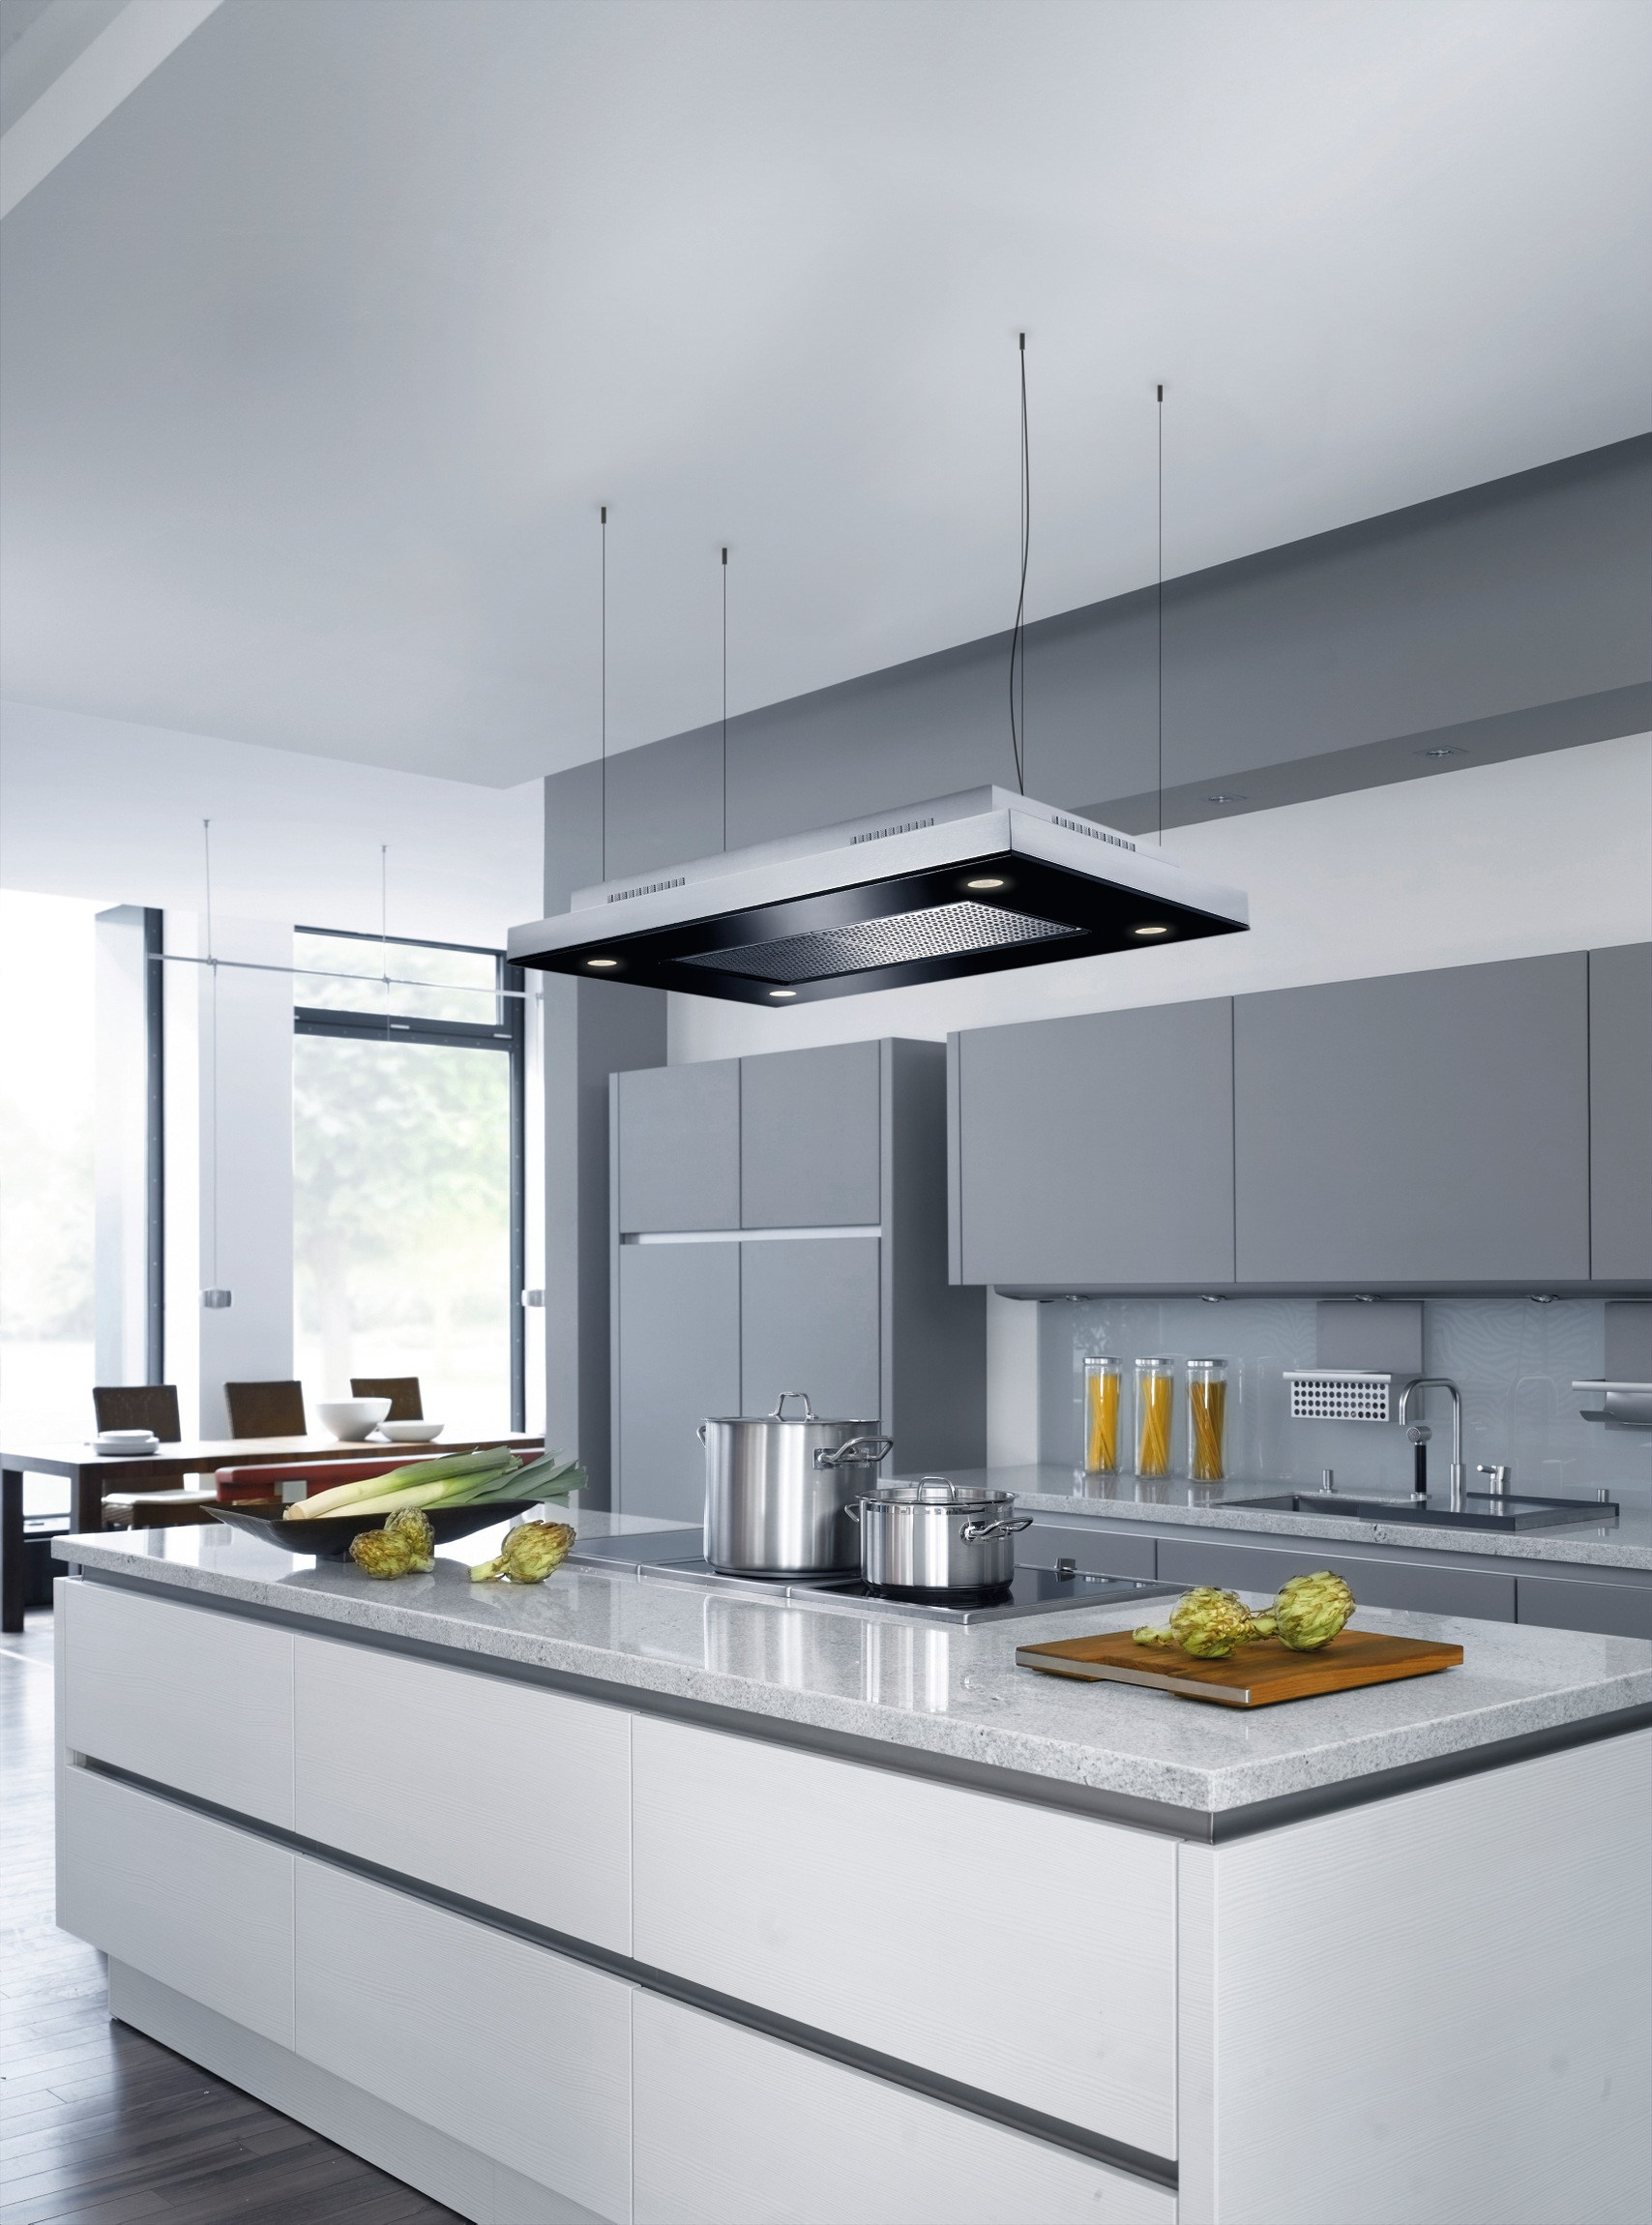 Campanas modernas para cocina latest house to home with - Campanas de cocina modernas ...